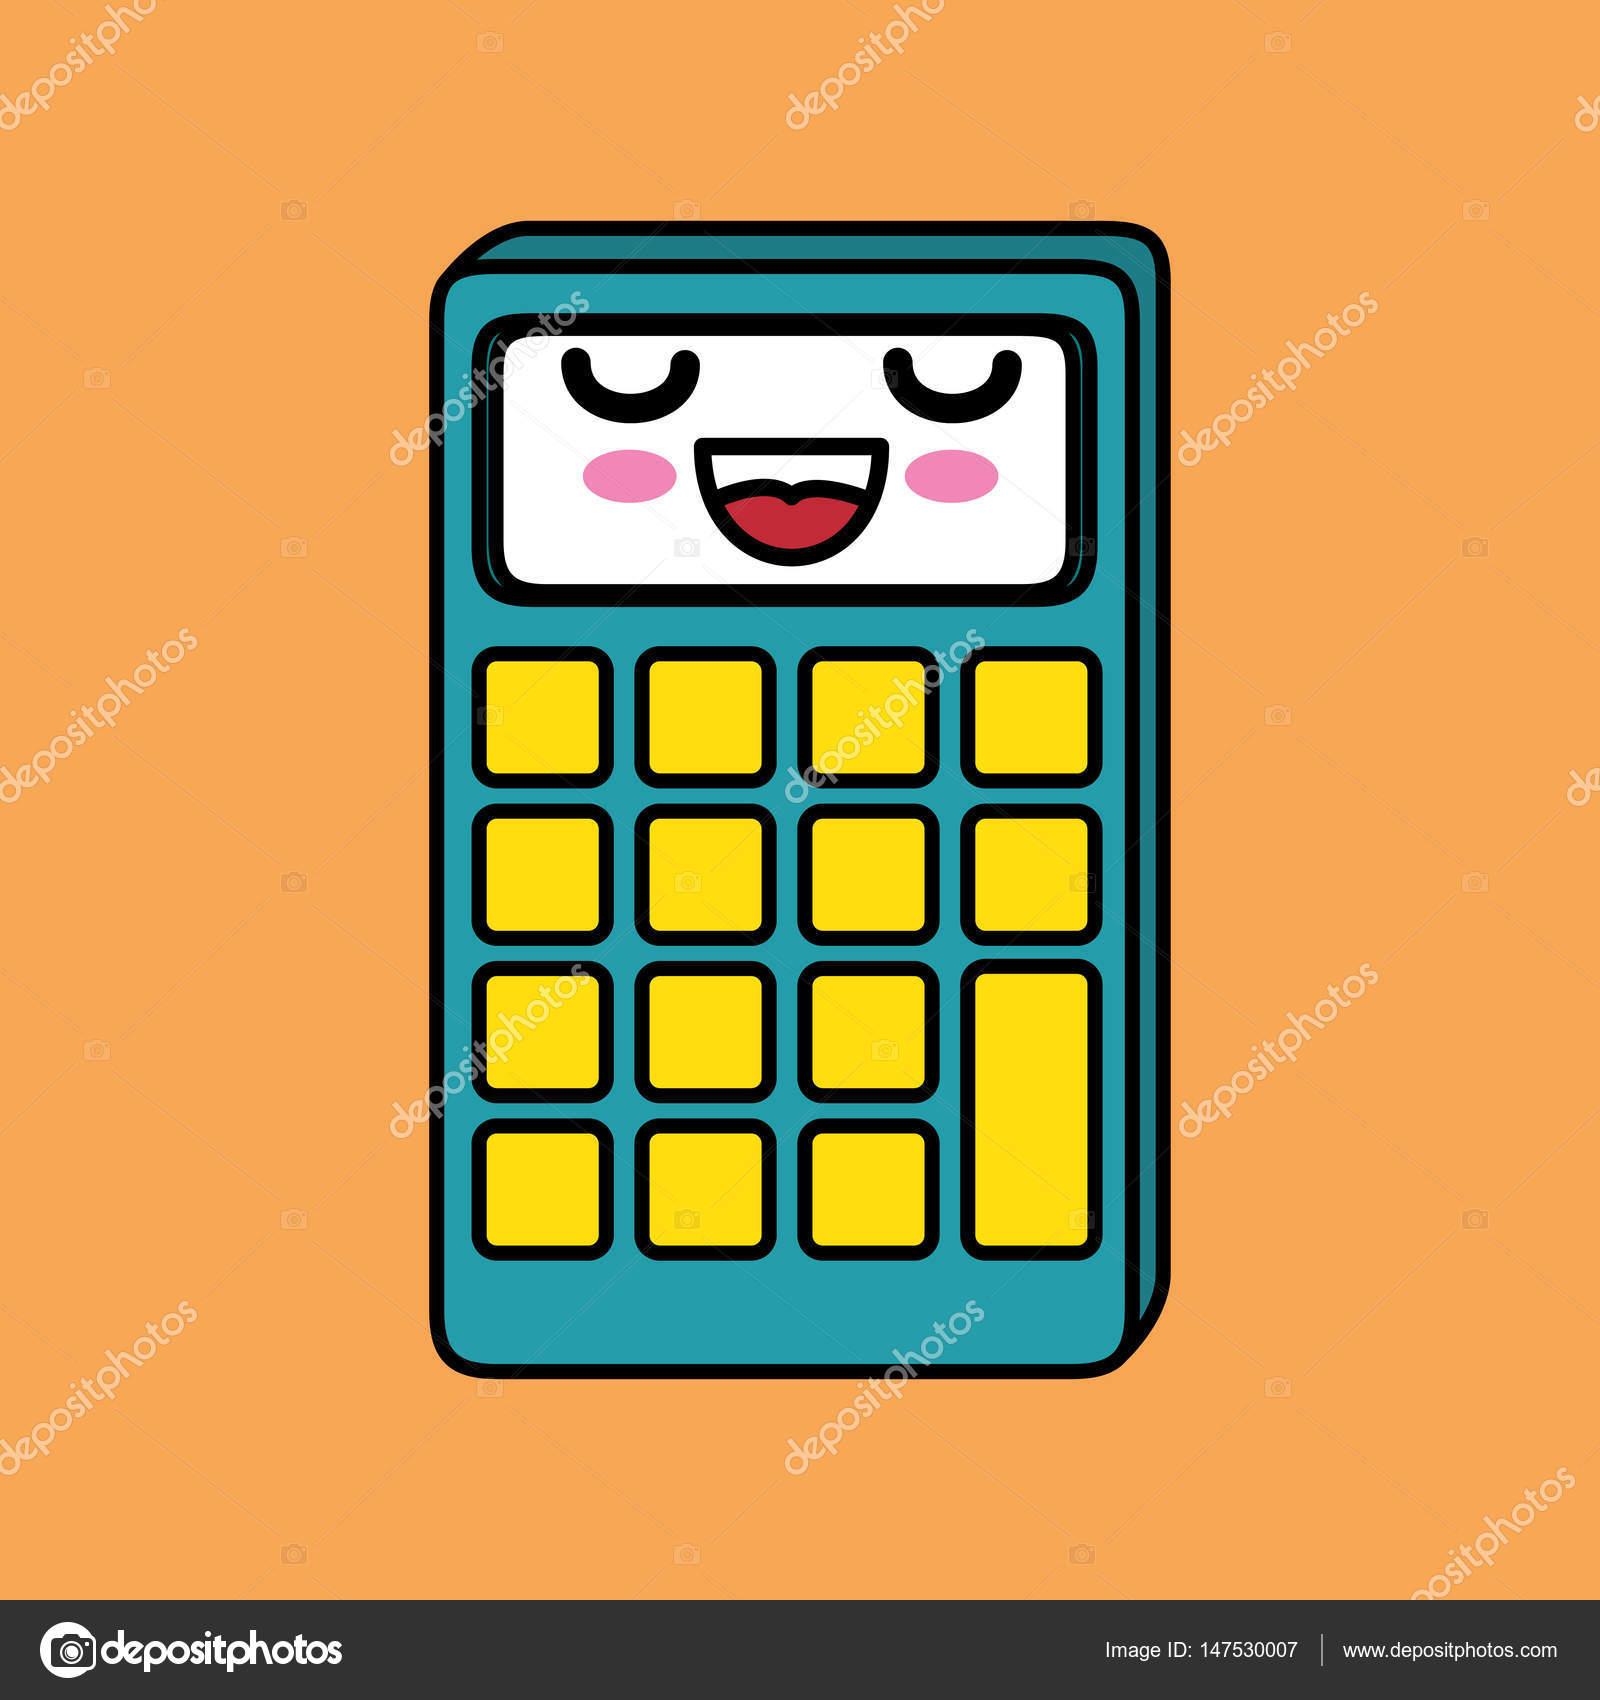 Imágenes Signos Matematicos Kawaii Calculadora Matemáticas